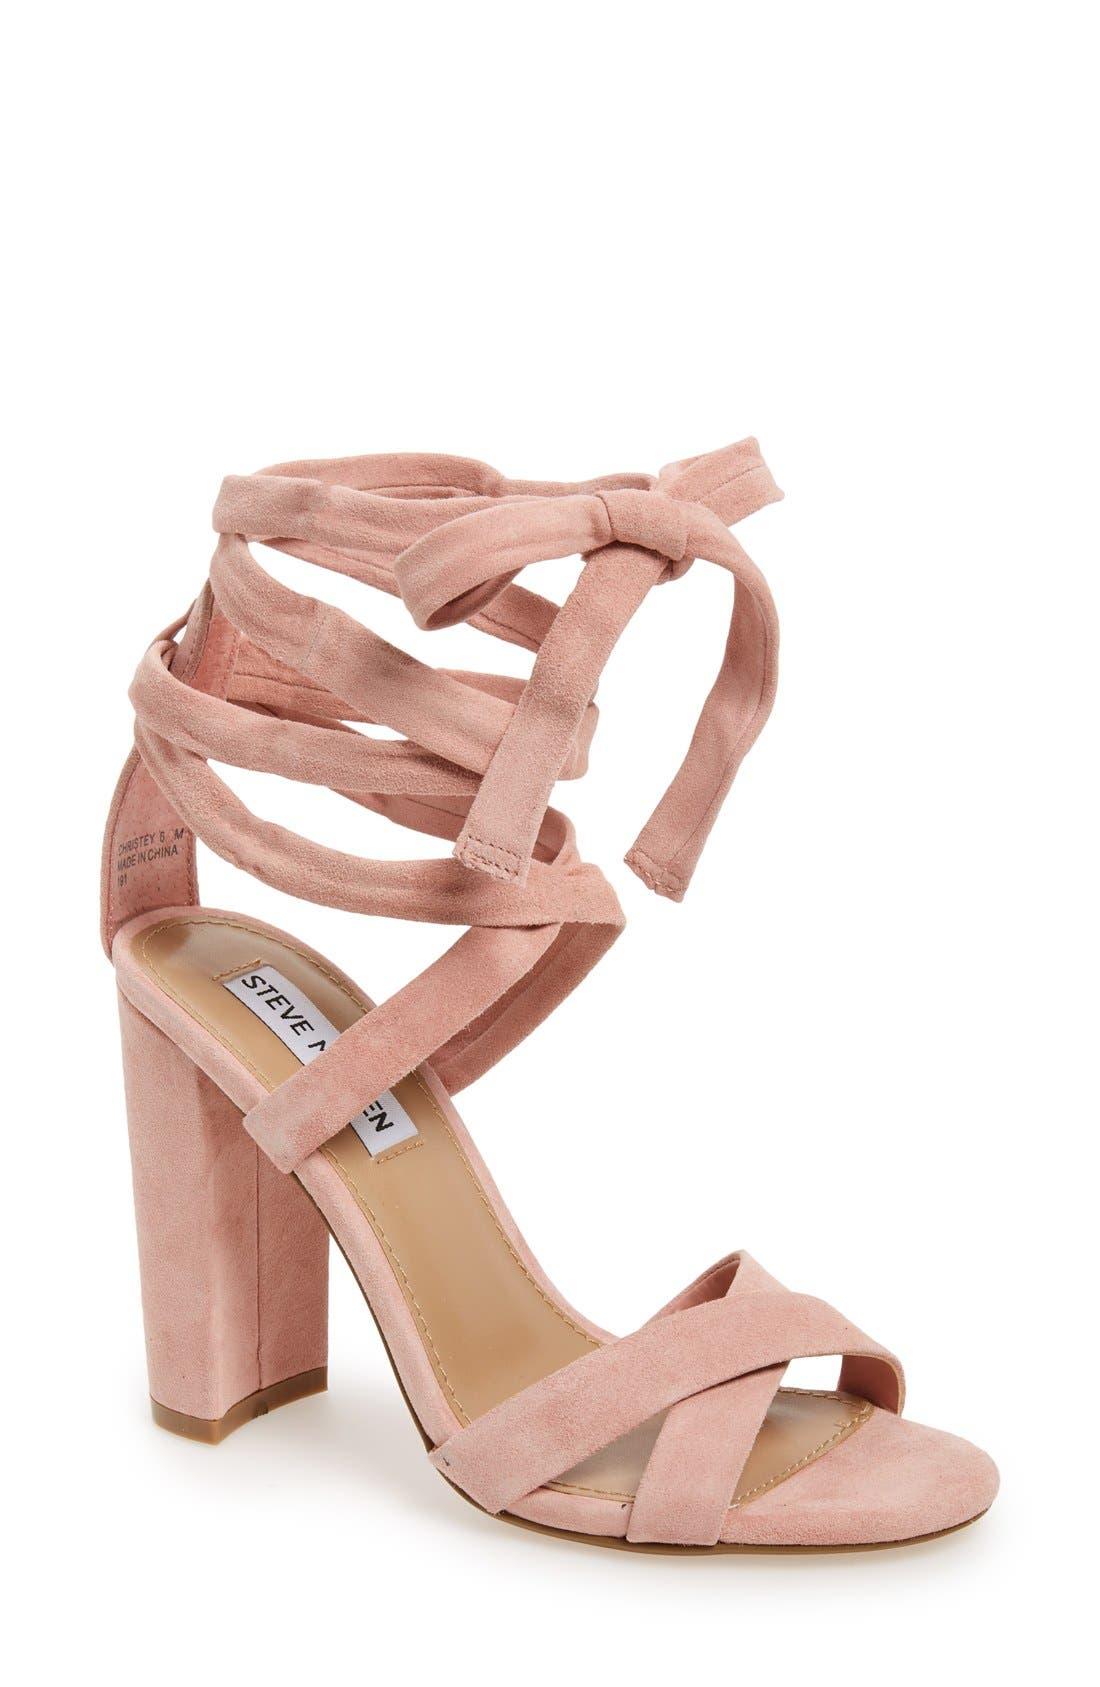 'Christey' Wraparound Ankle Tie Sandal,                         Main,                         color, 650